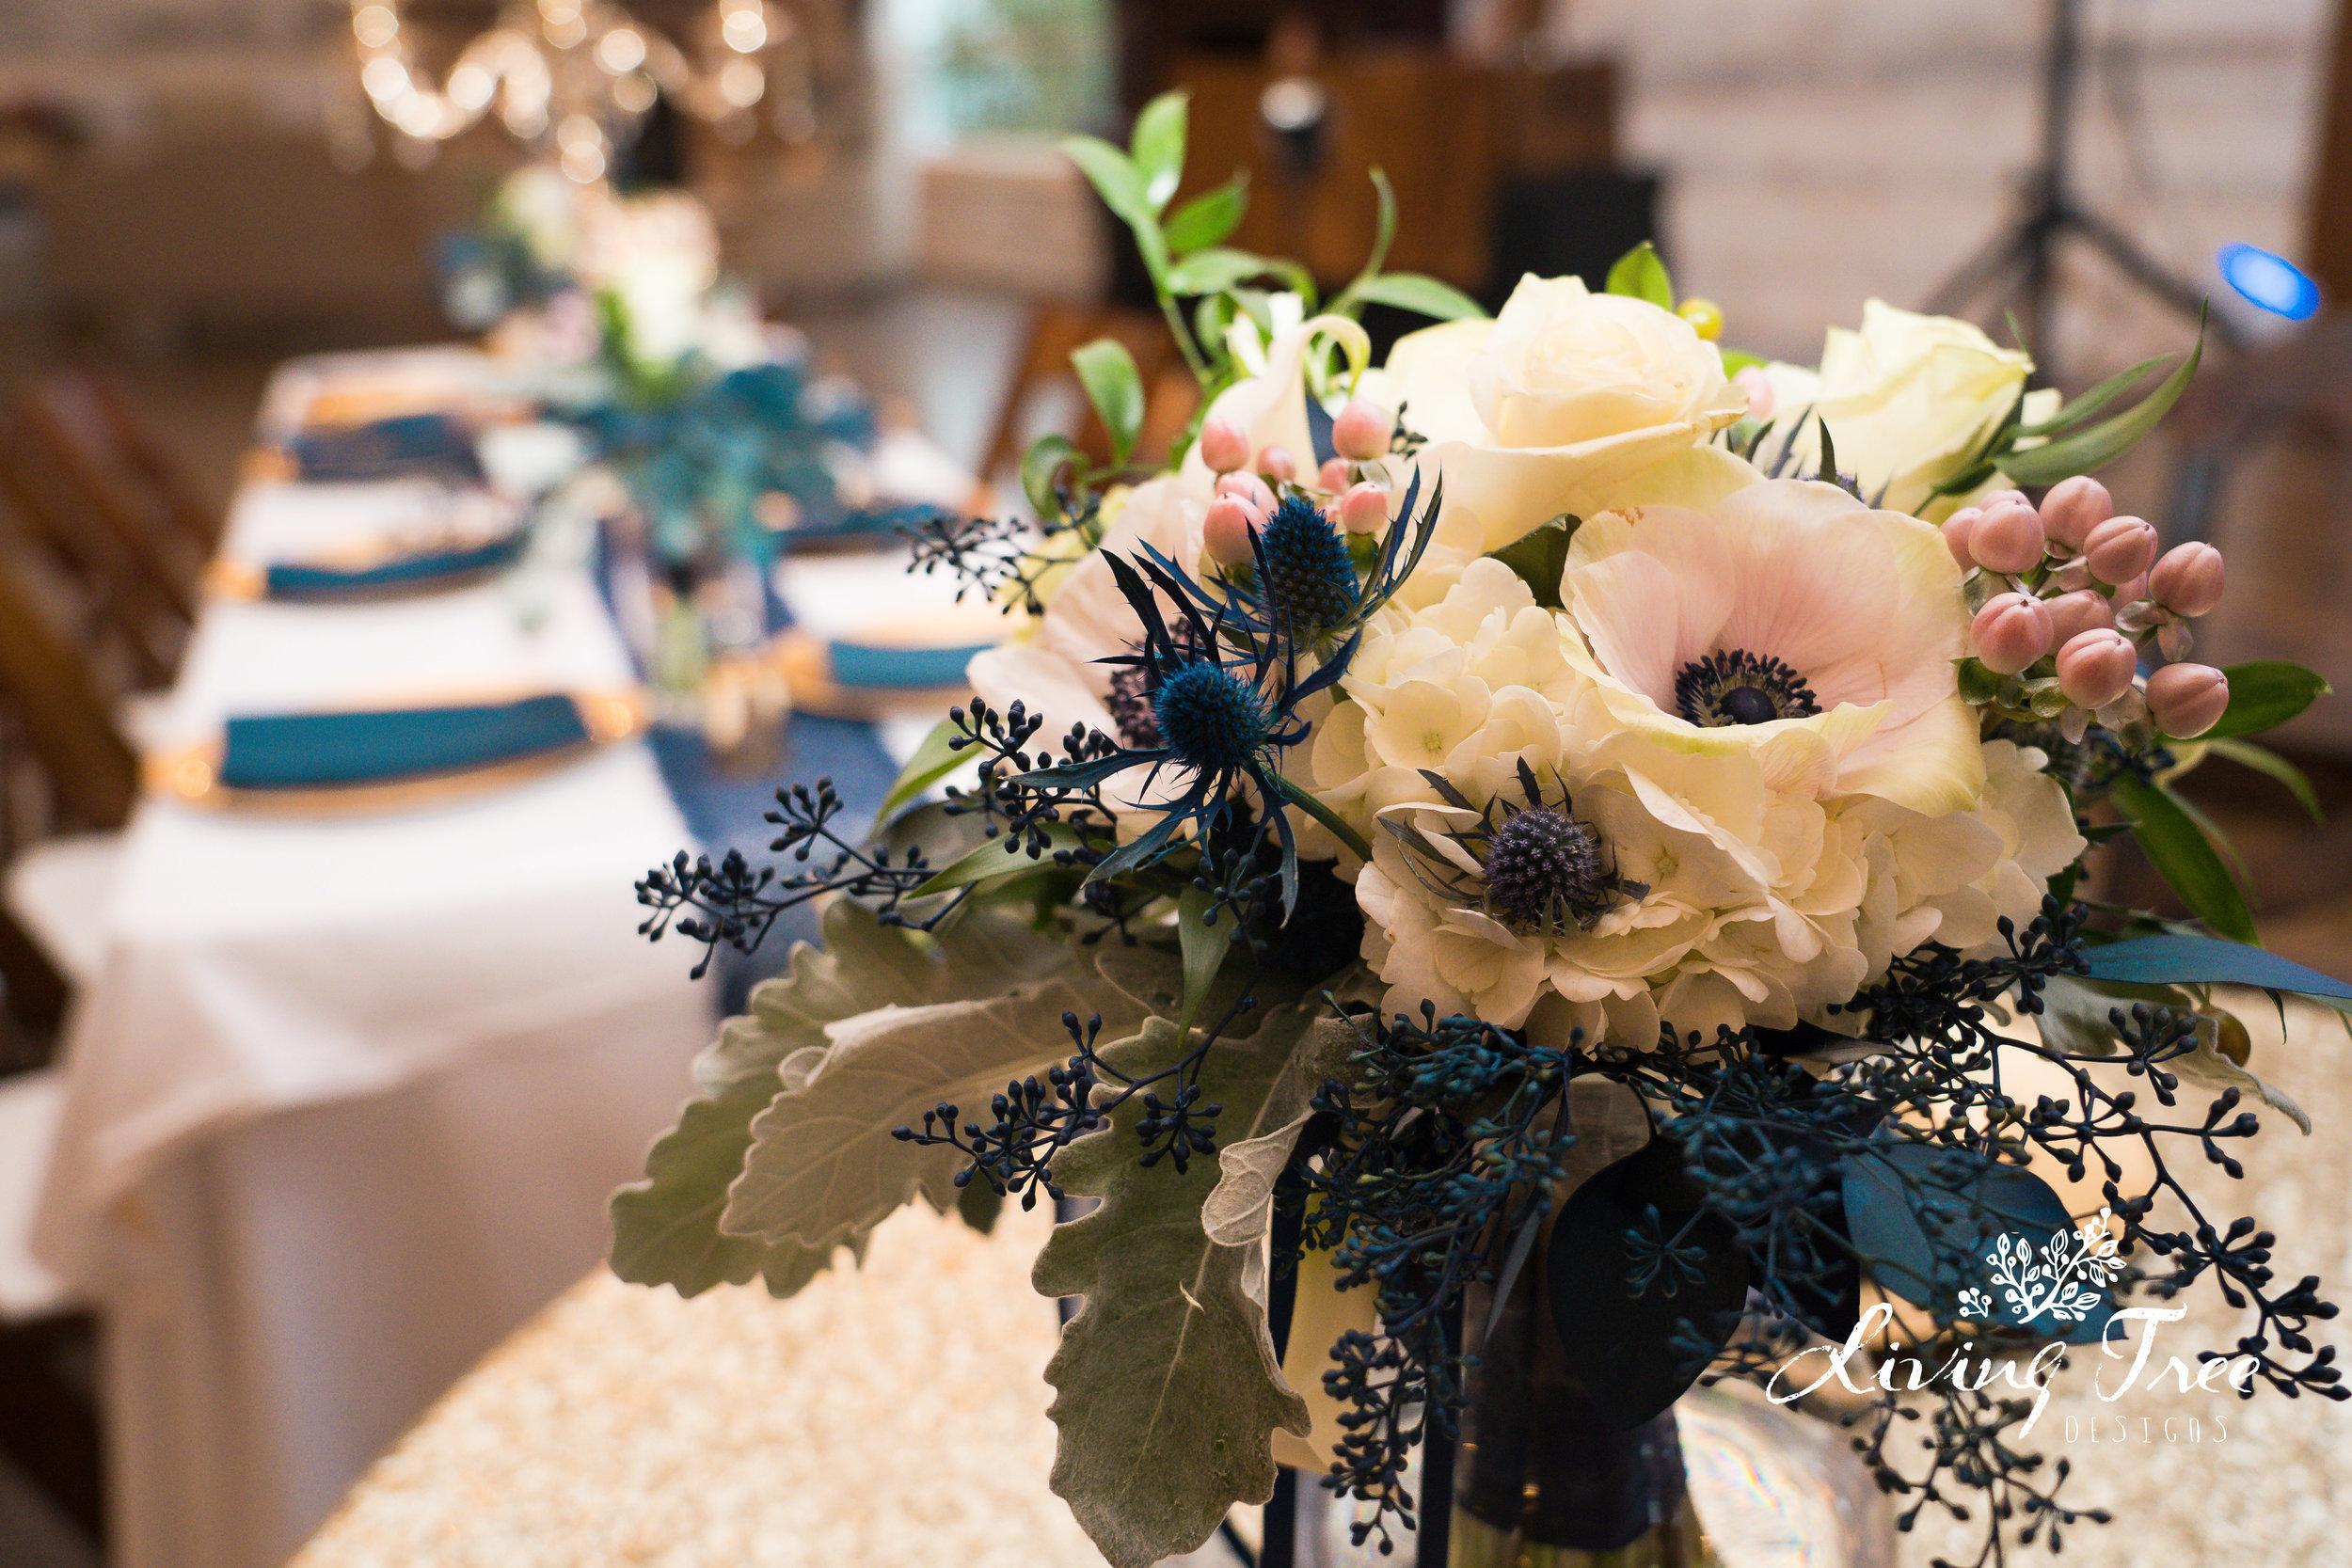 Flowers by Devault Floral Lubbock, Texas  Wedding: Williams- Bates Wedding, Eberley Brooks Event Center, November 2018